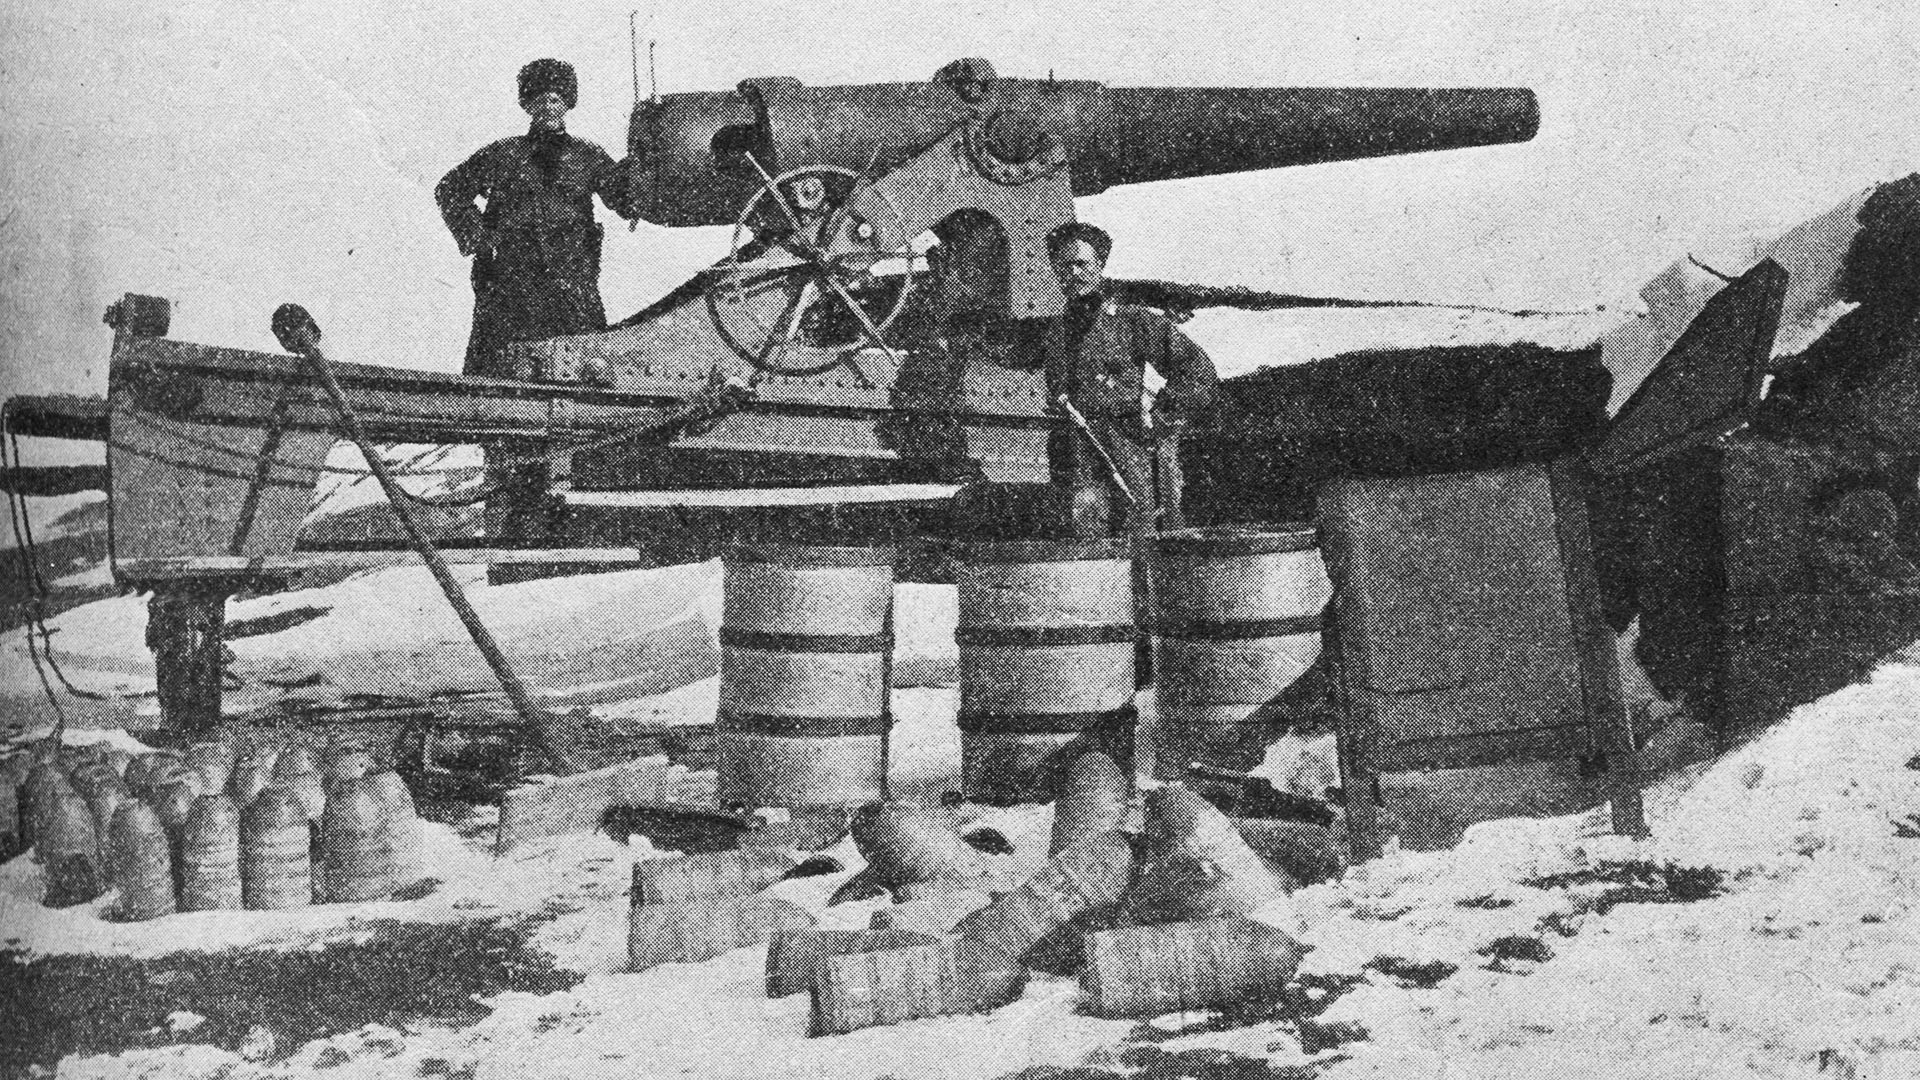 The Turkish artillery gun, captured by Russians in Erzurum.